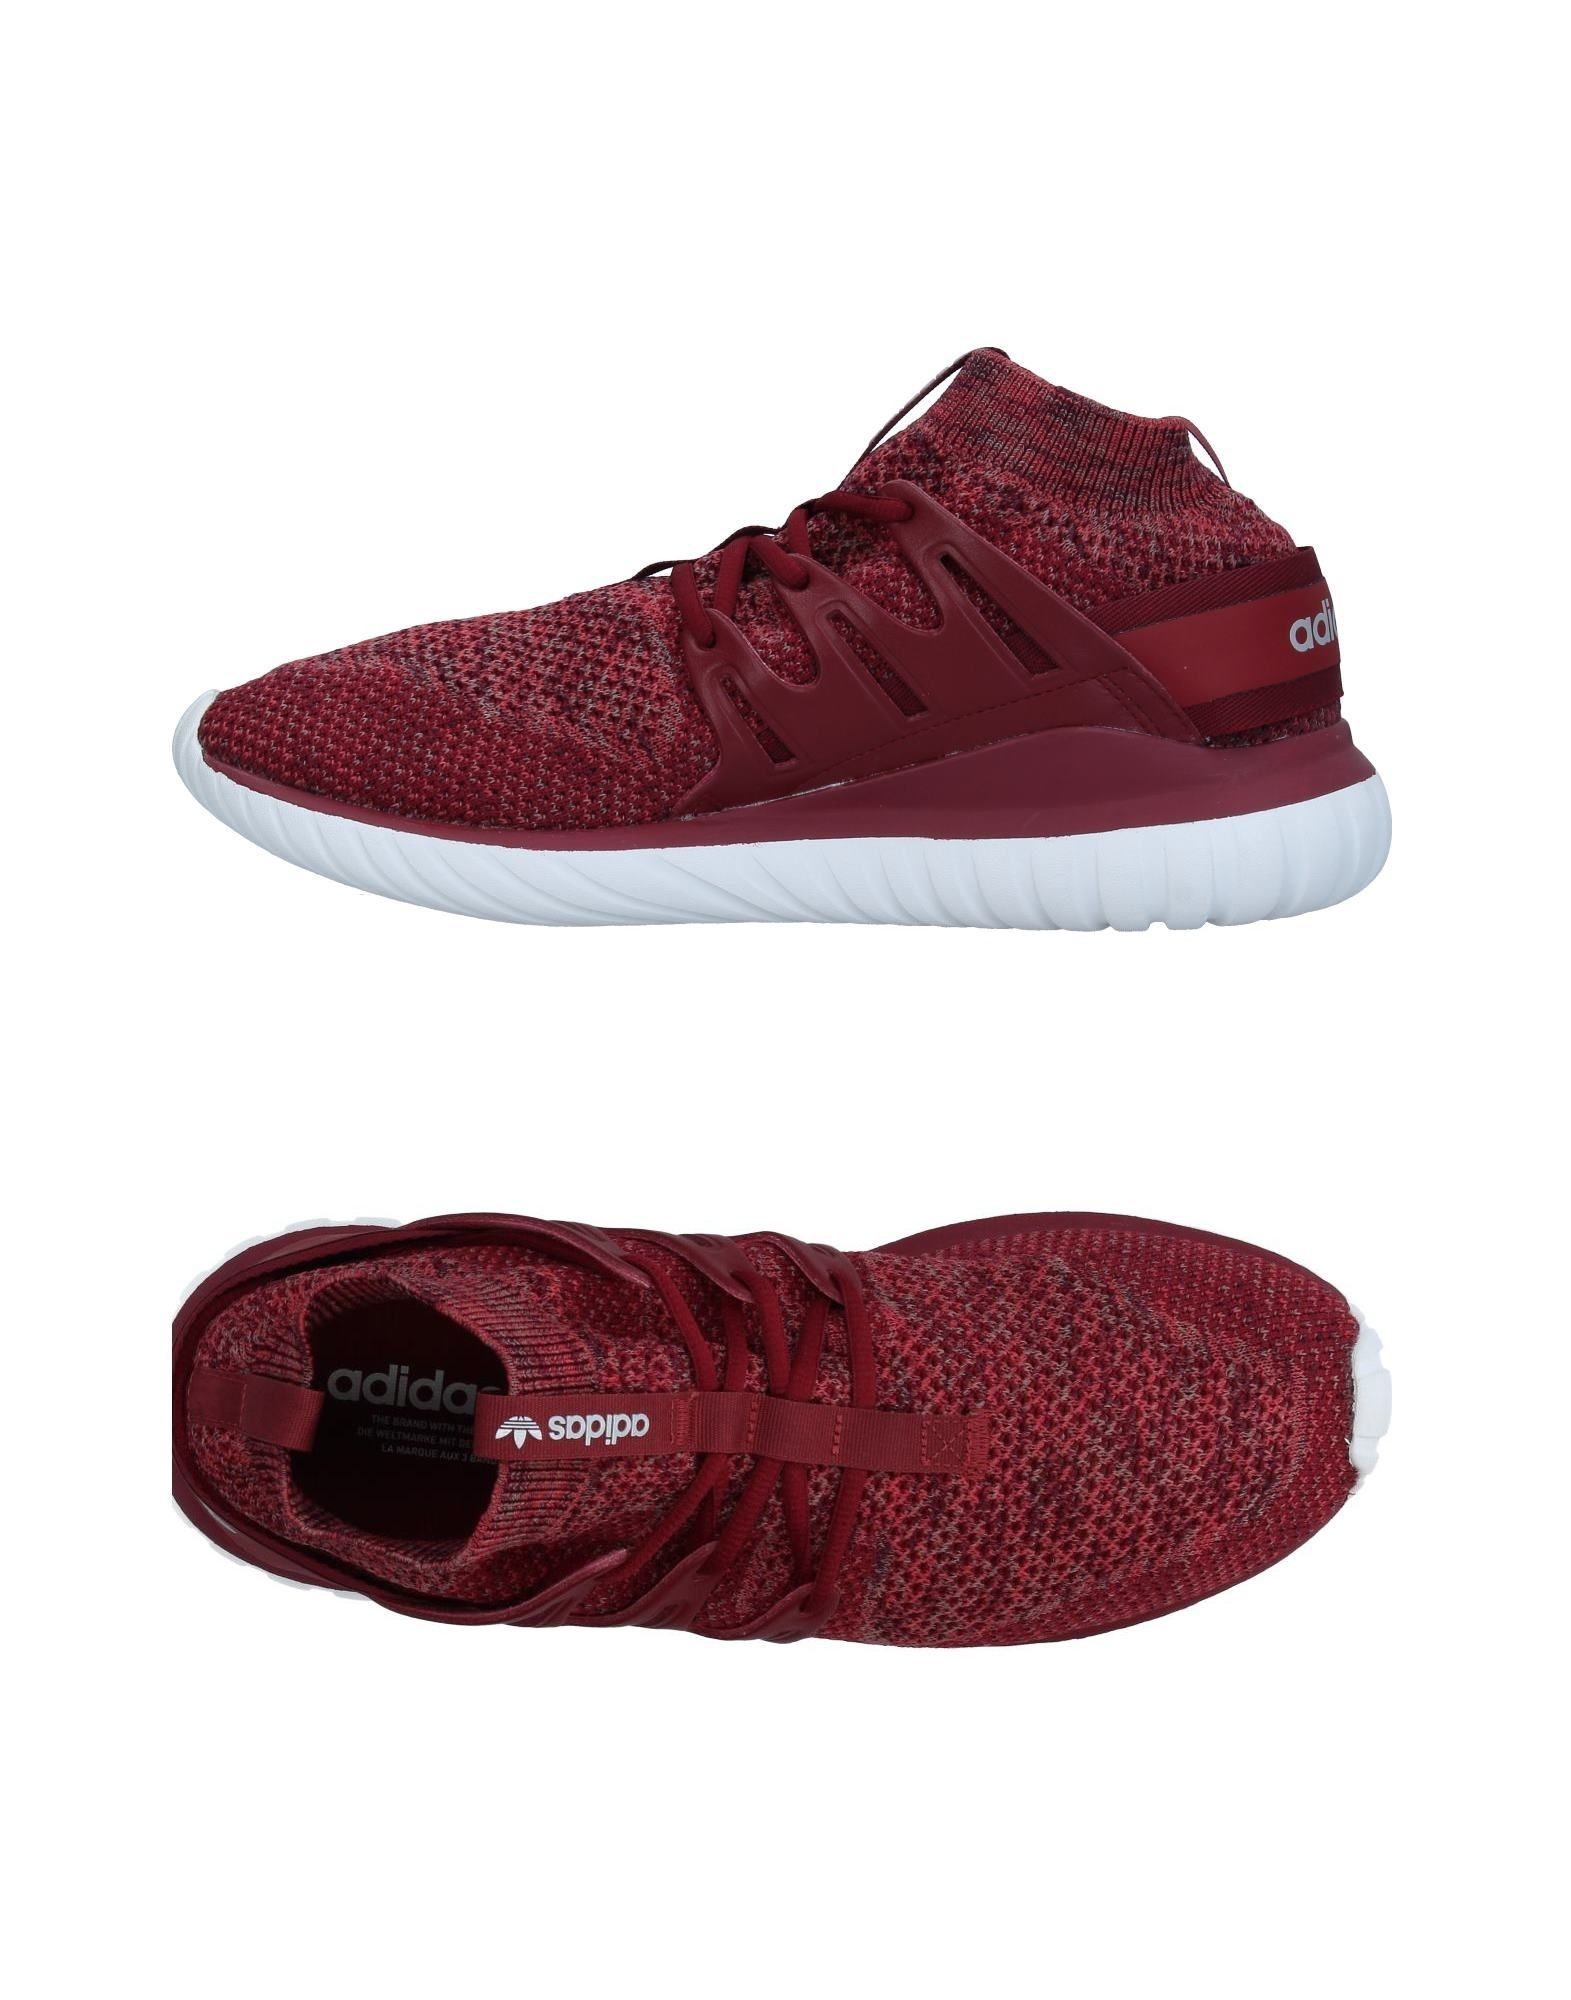 Adidas Originals Sneakers - Men Adidas  Originals Sneakers online on  Adidas Australia - 11335793GC 664435